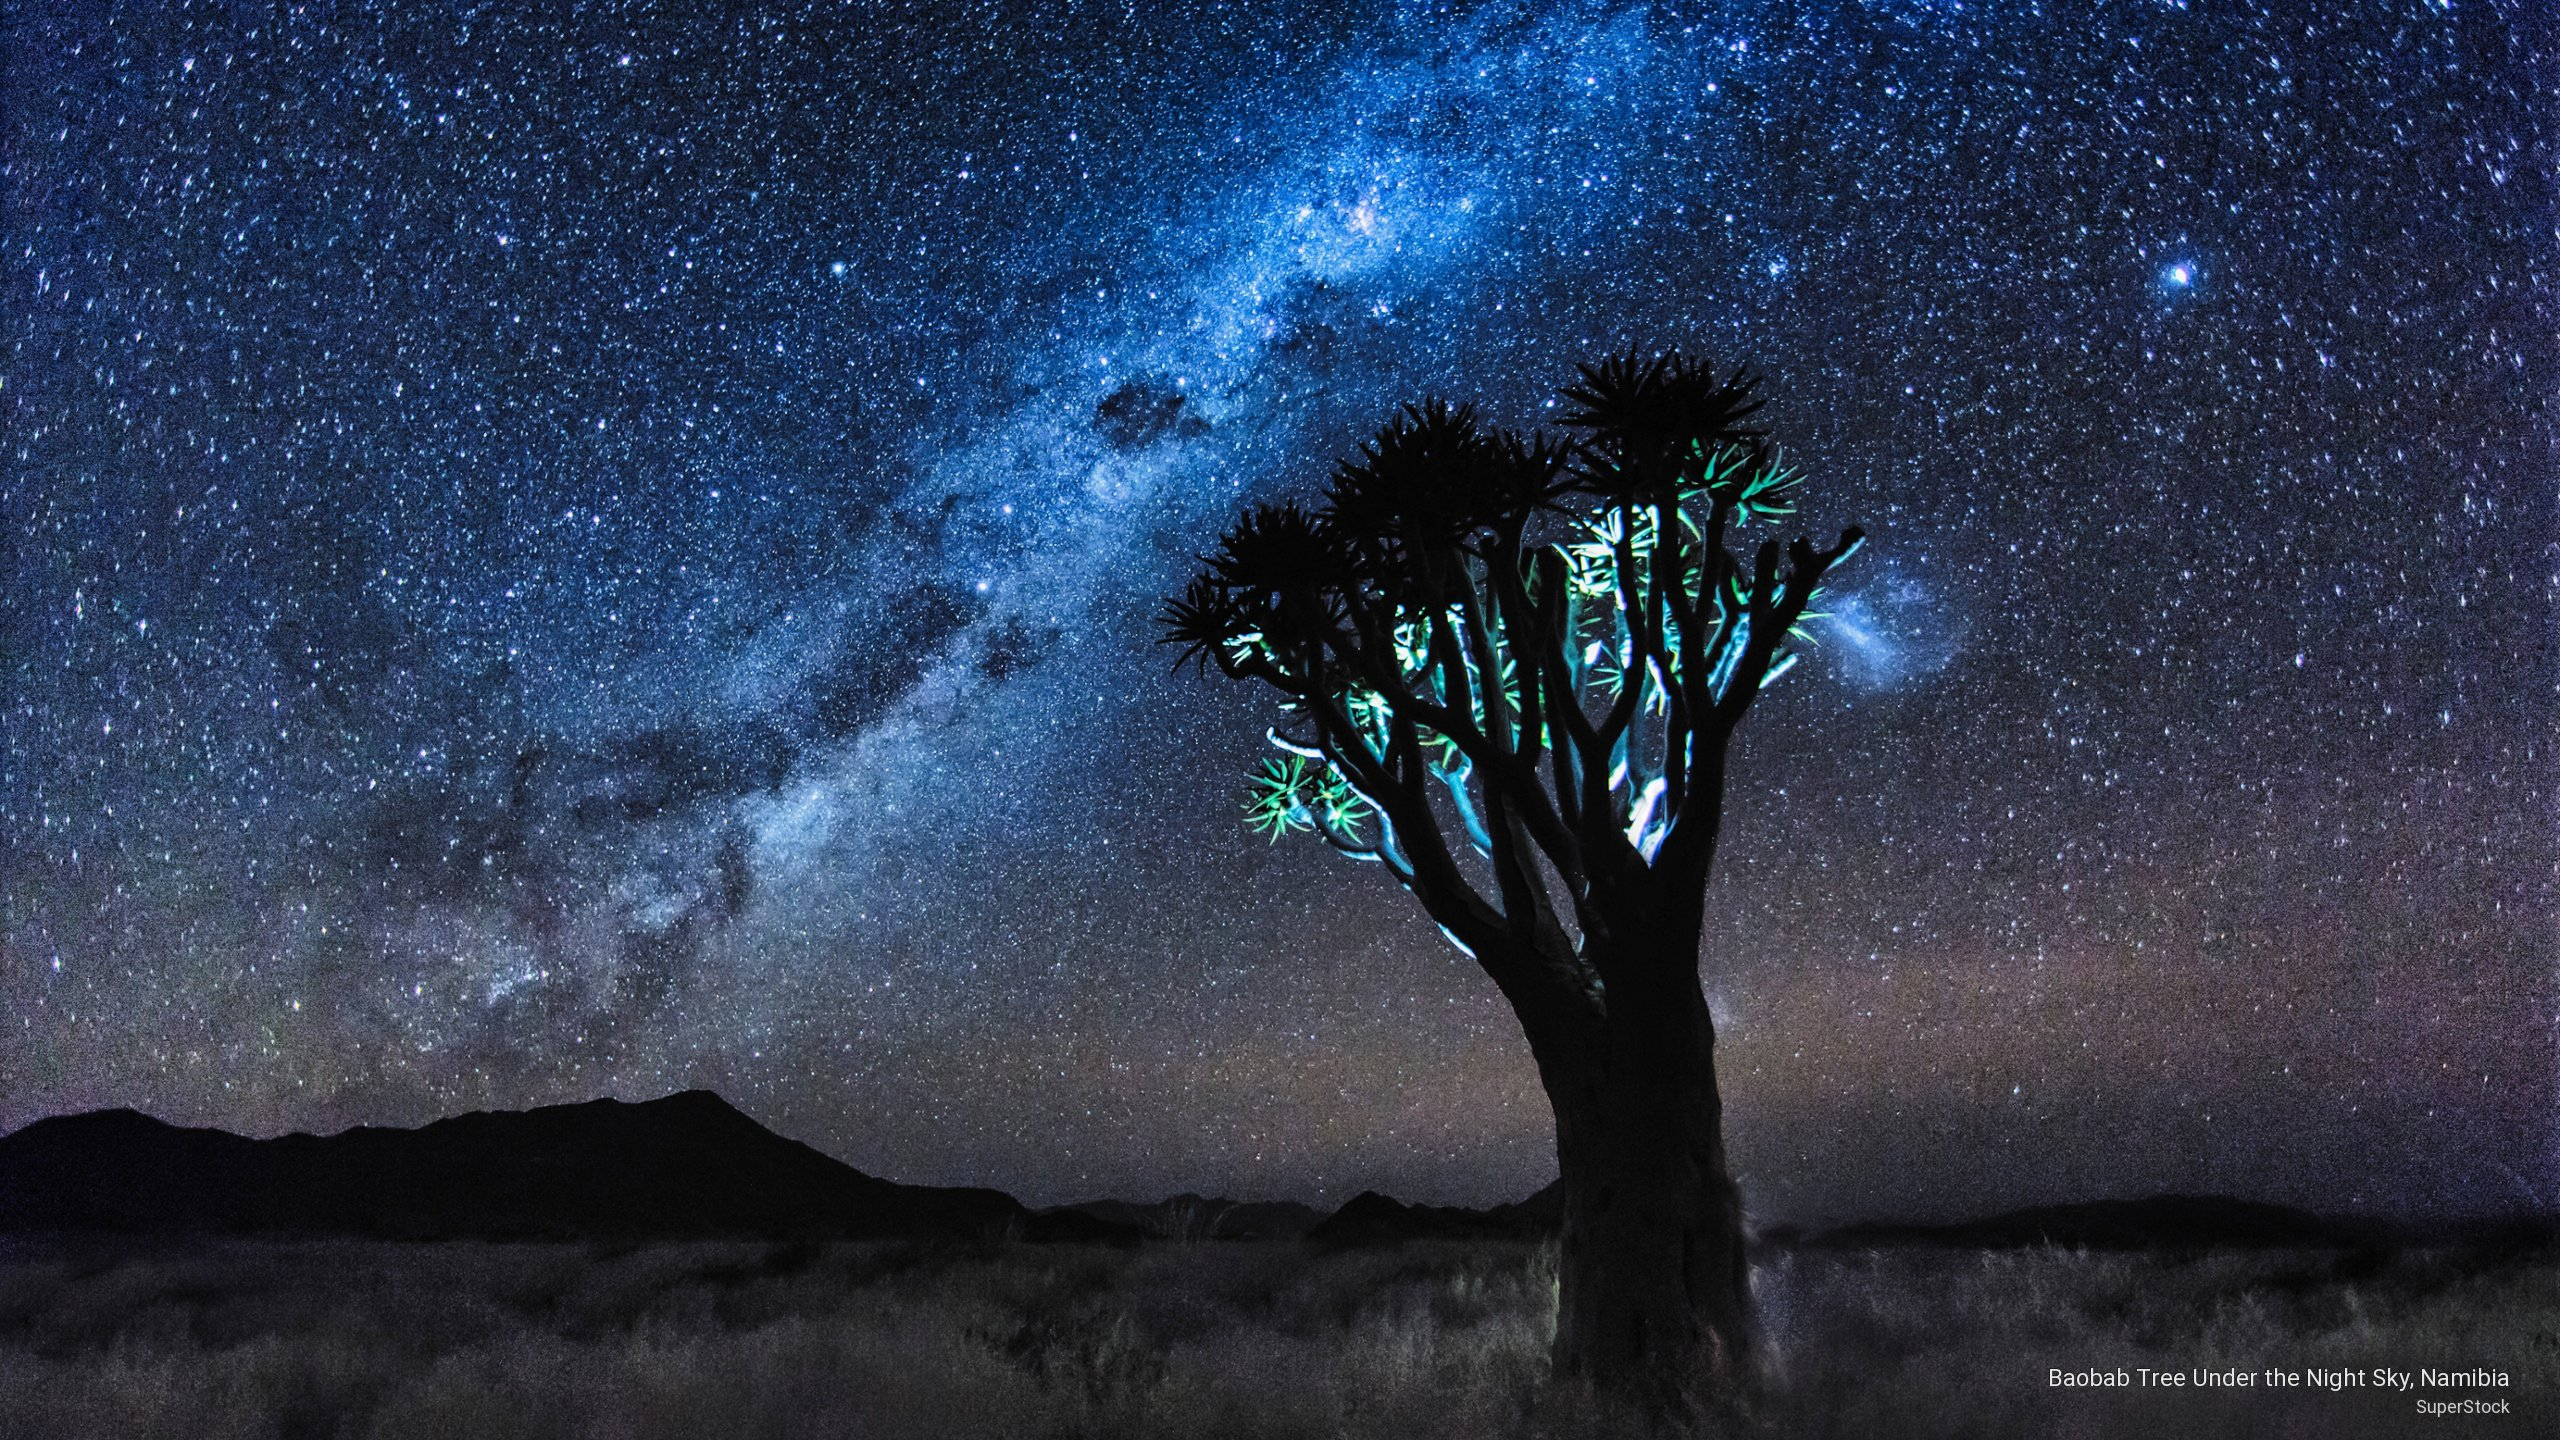 Baobab Tree Under the Night Sky, Namibia